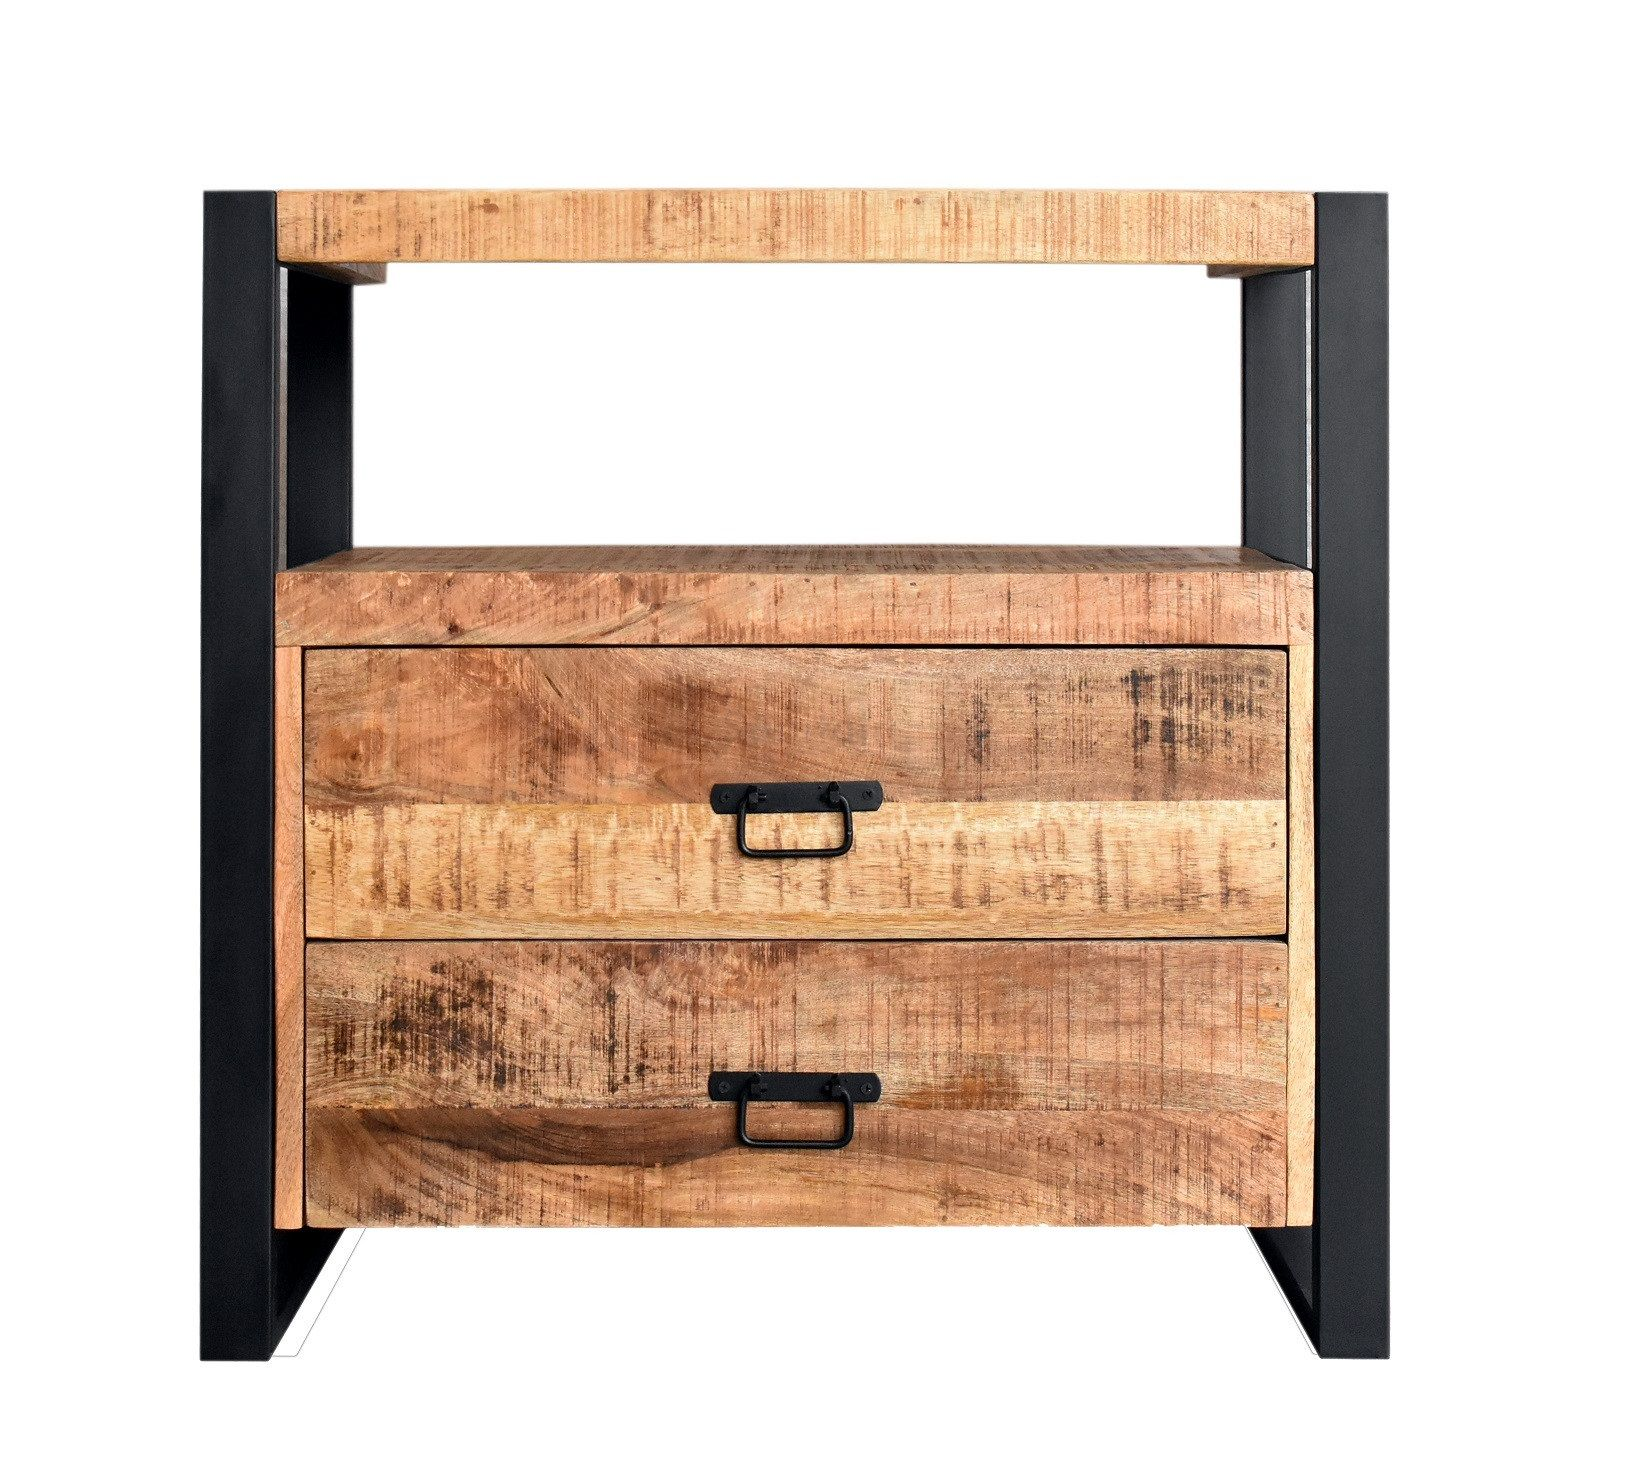 Onderkast Boss & Wessing Mango Wood 80x45x81cm Met Mat Zwart Metaal kopen - Tegel Depot sanitair met korting